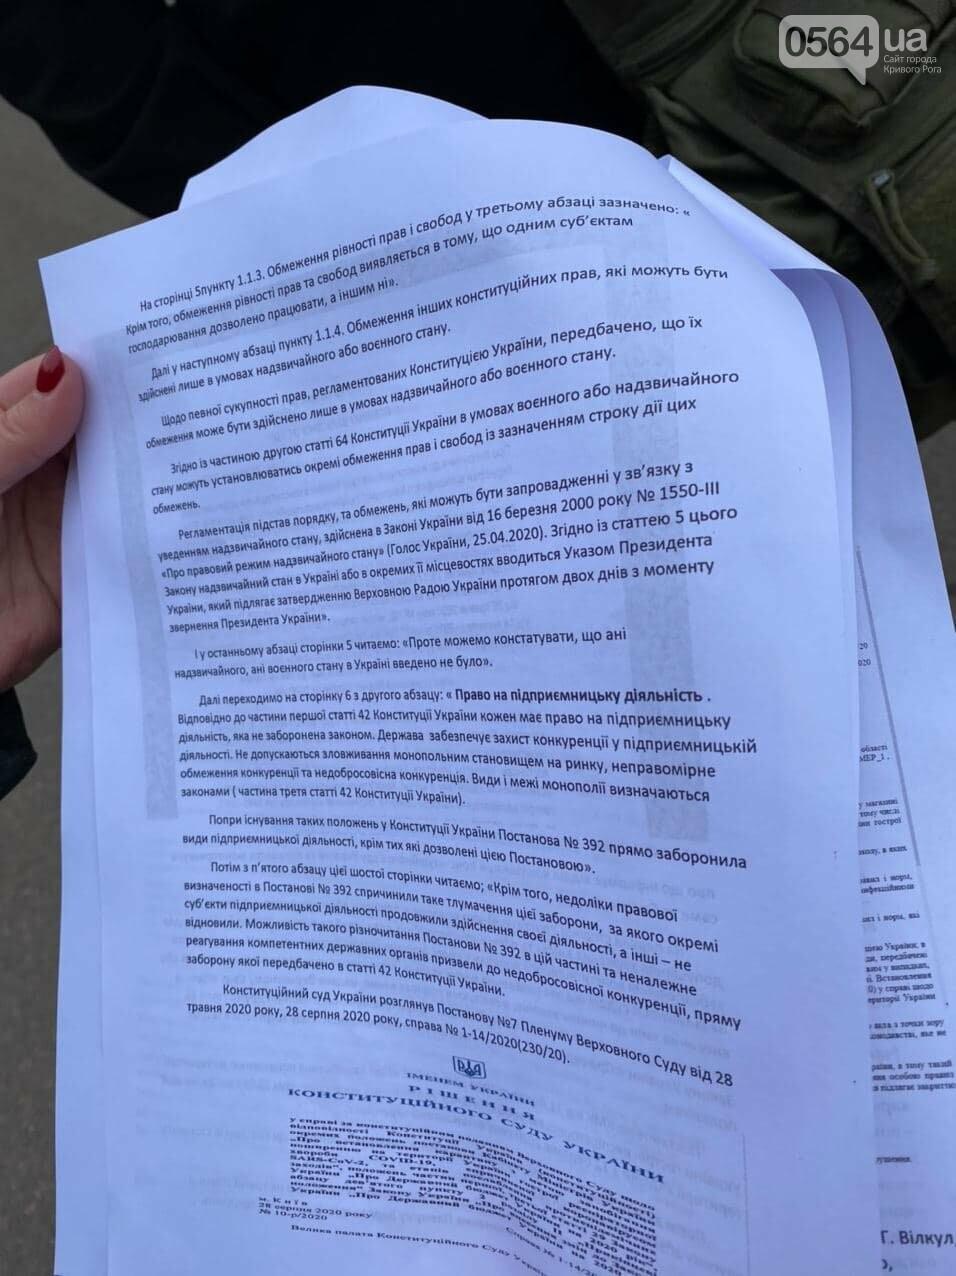 Представители малого бизнеса продолжили протест возле мэрии Кривого Рога, - ФОТО, ВИДЕО, фото-8